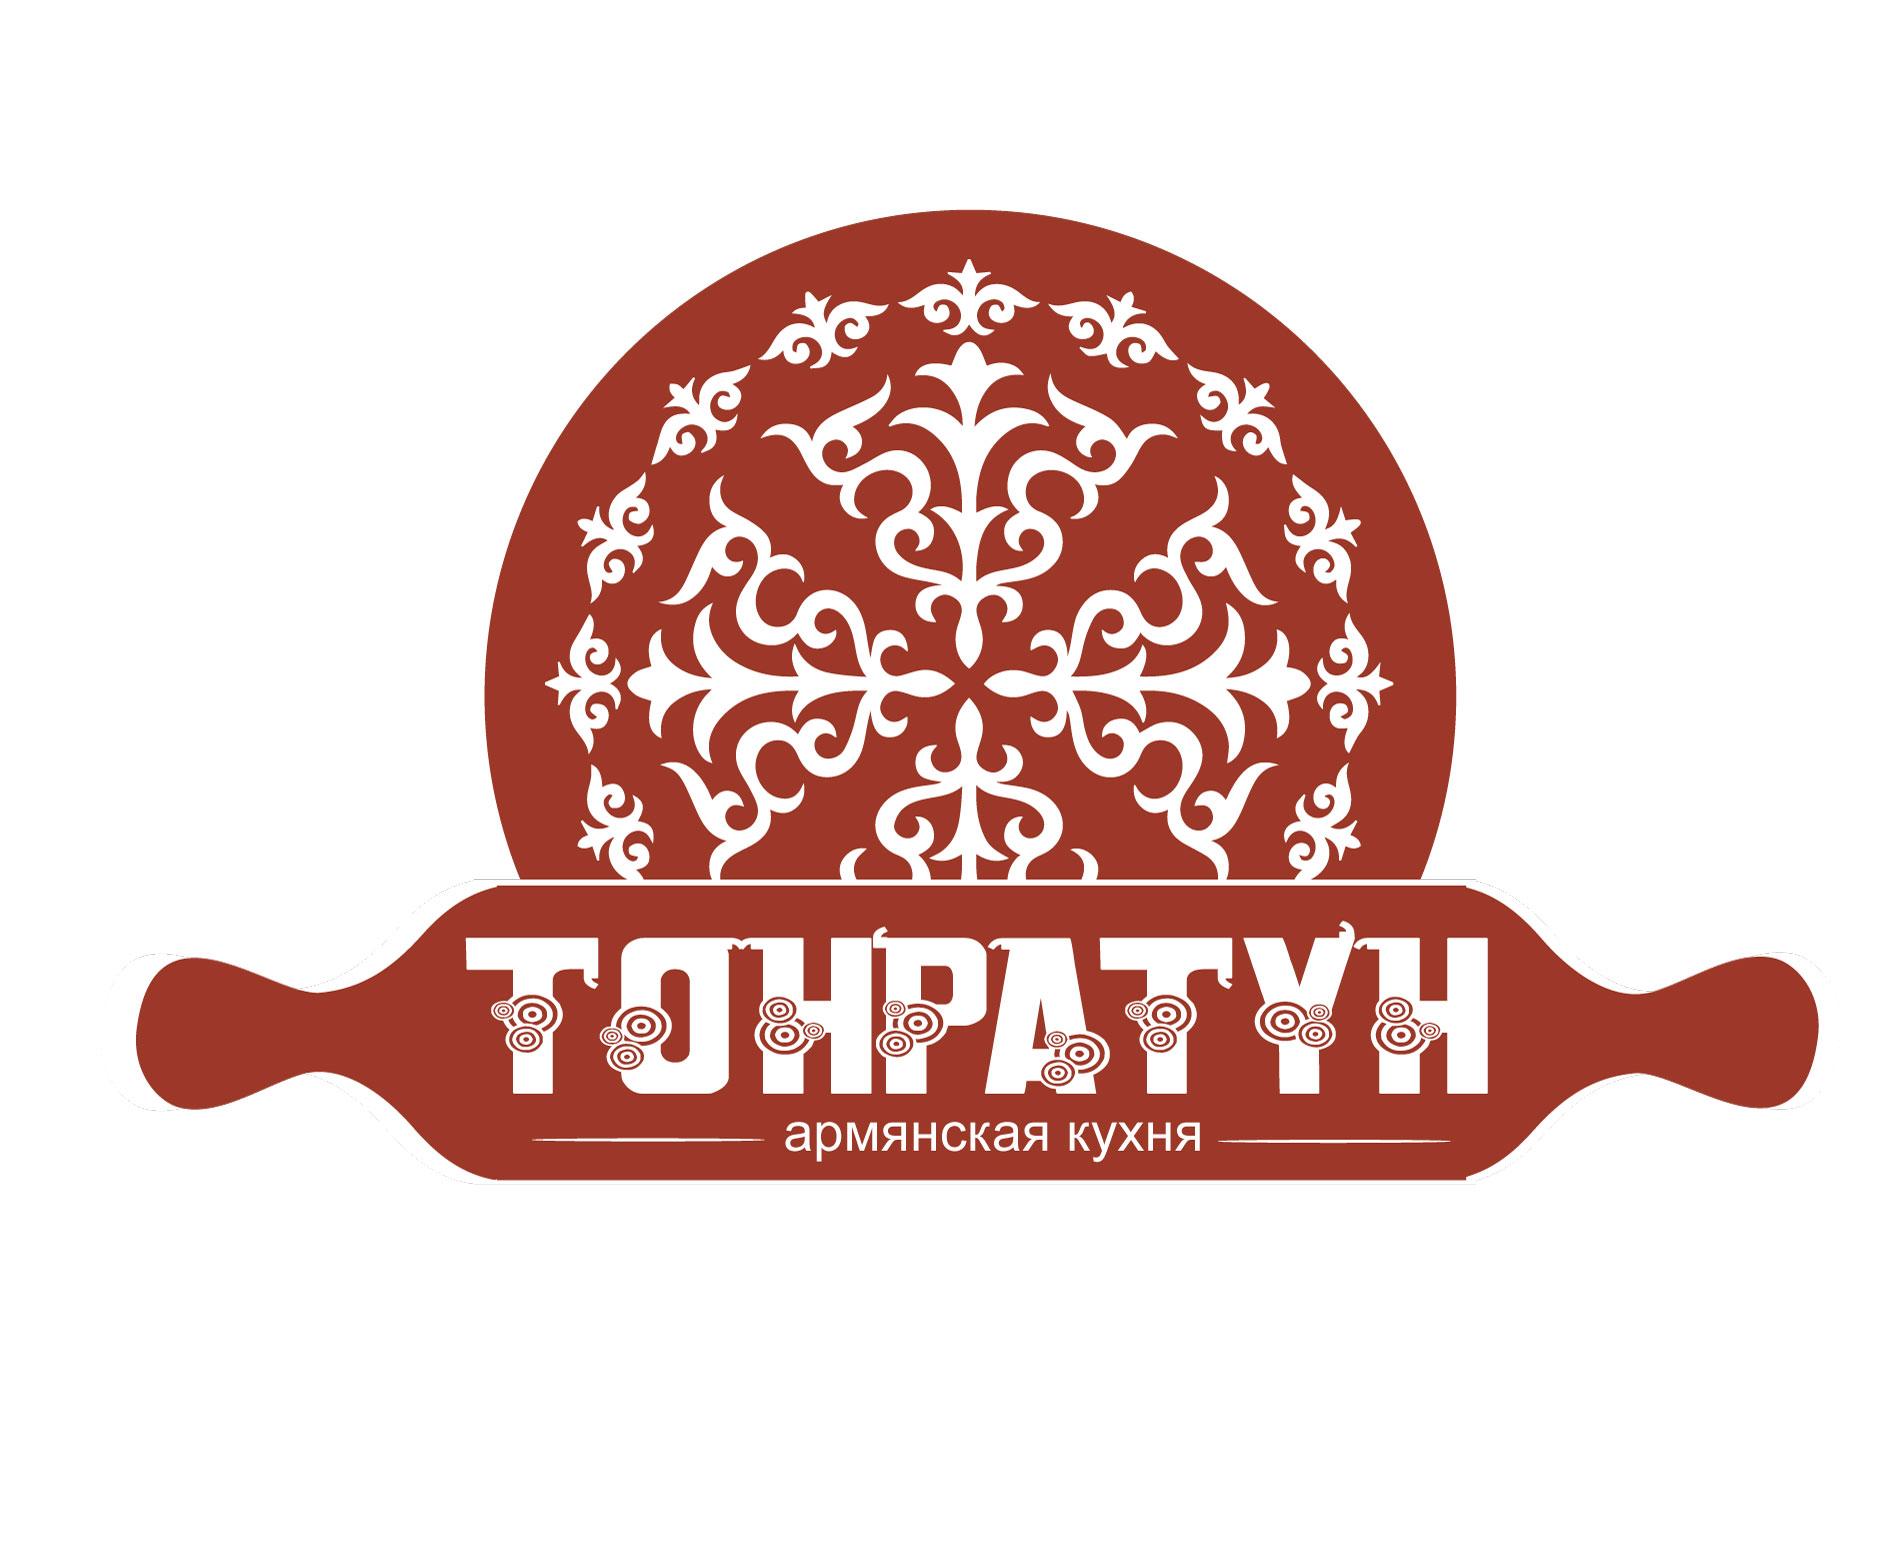 Логотип для Пекарни-Тандырной  фото f_1785d8fa9445e474.jpg